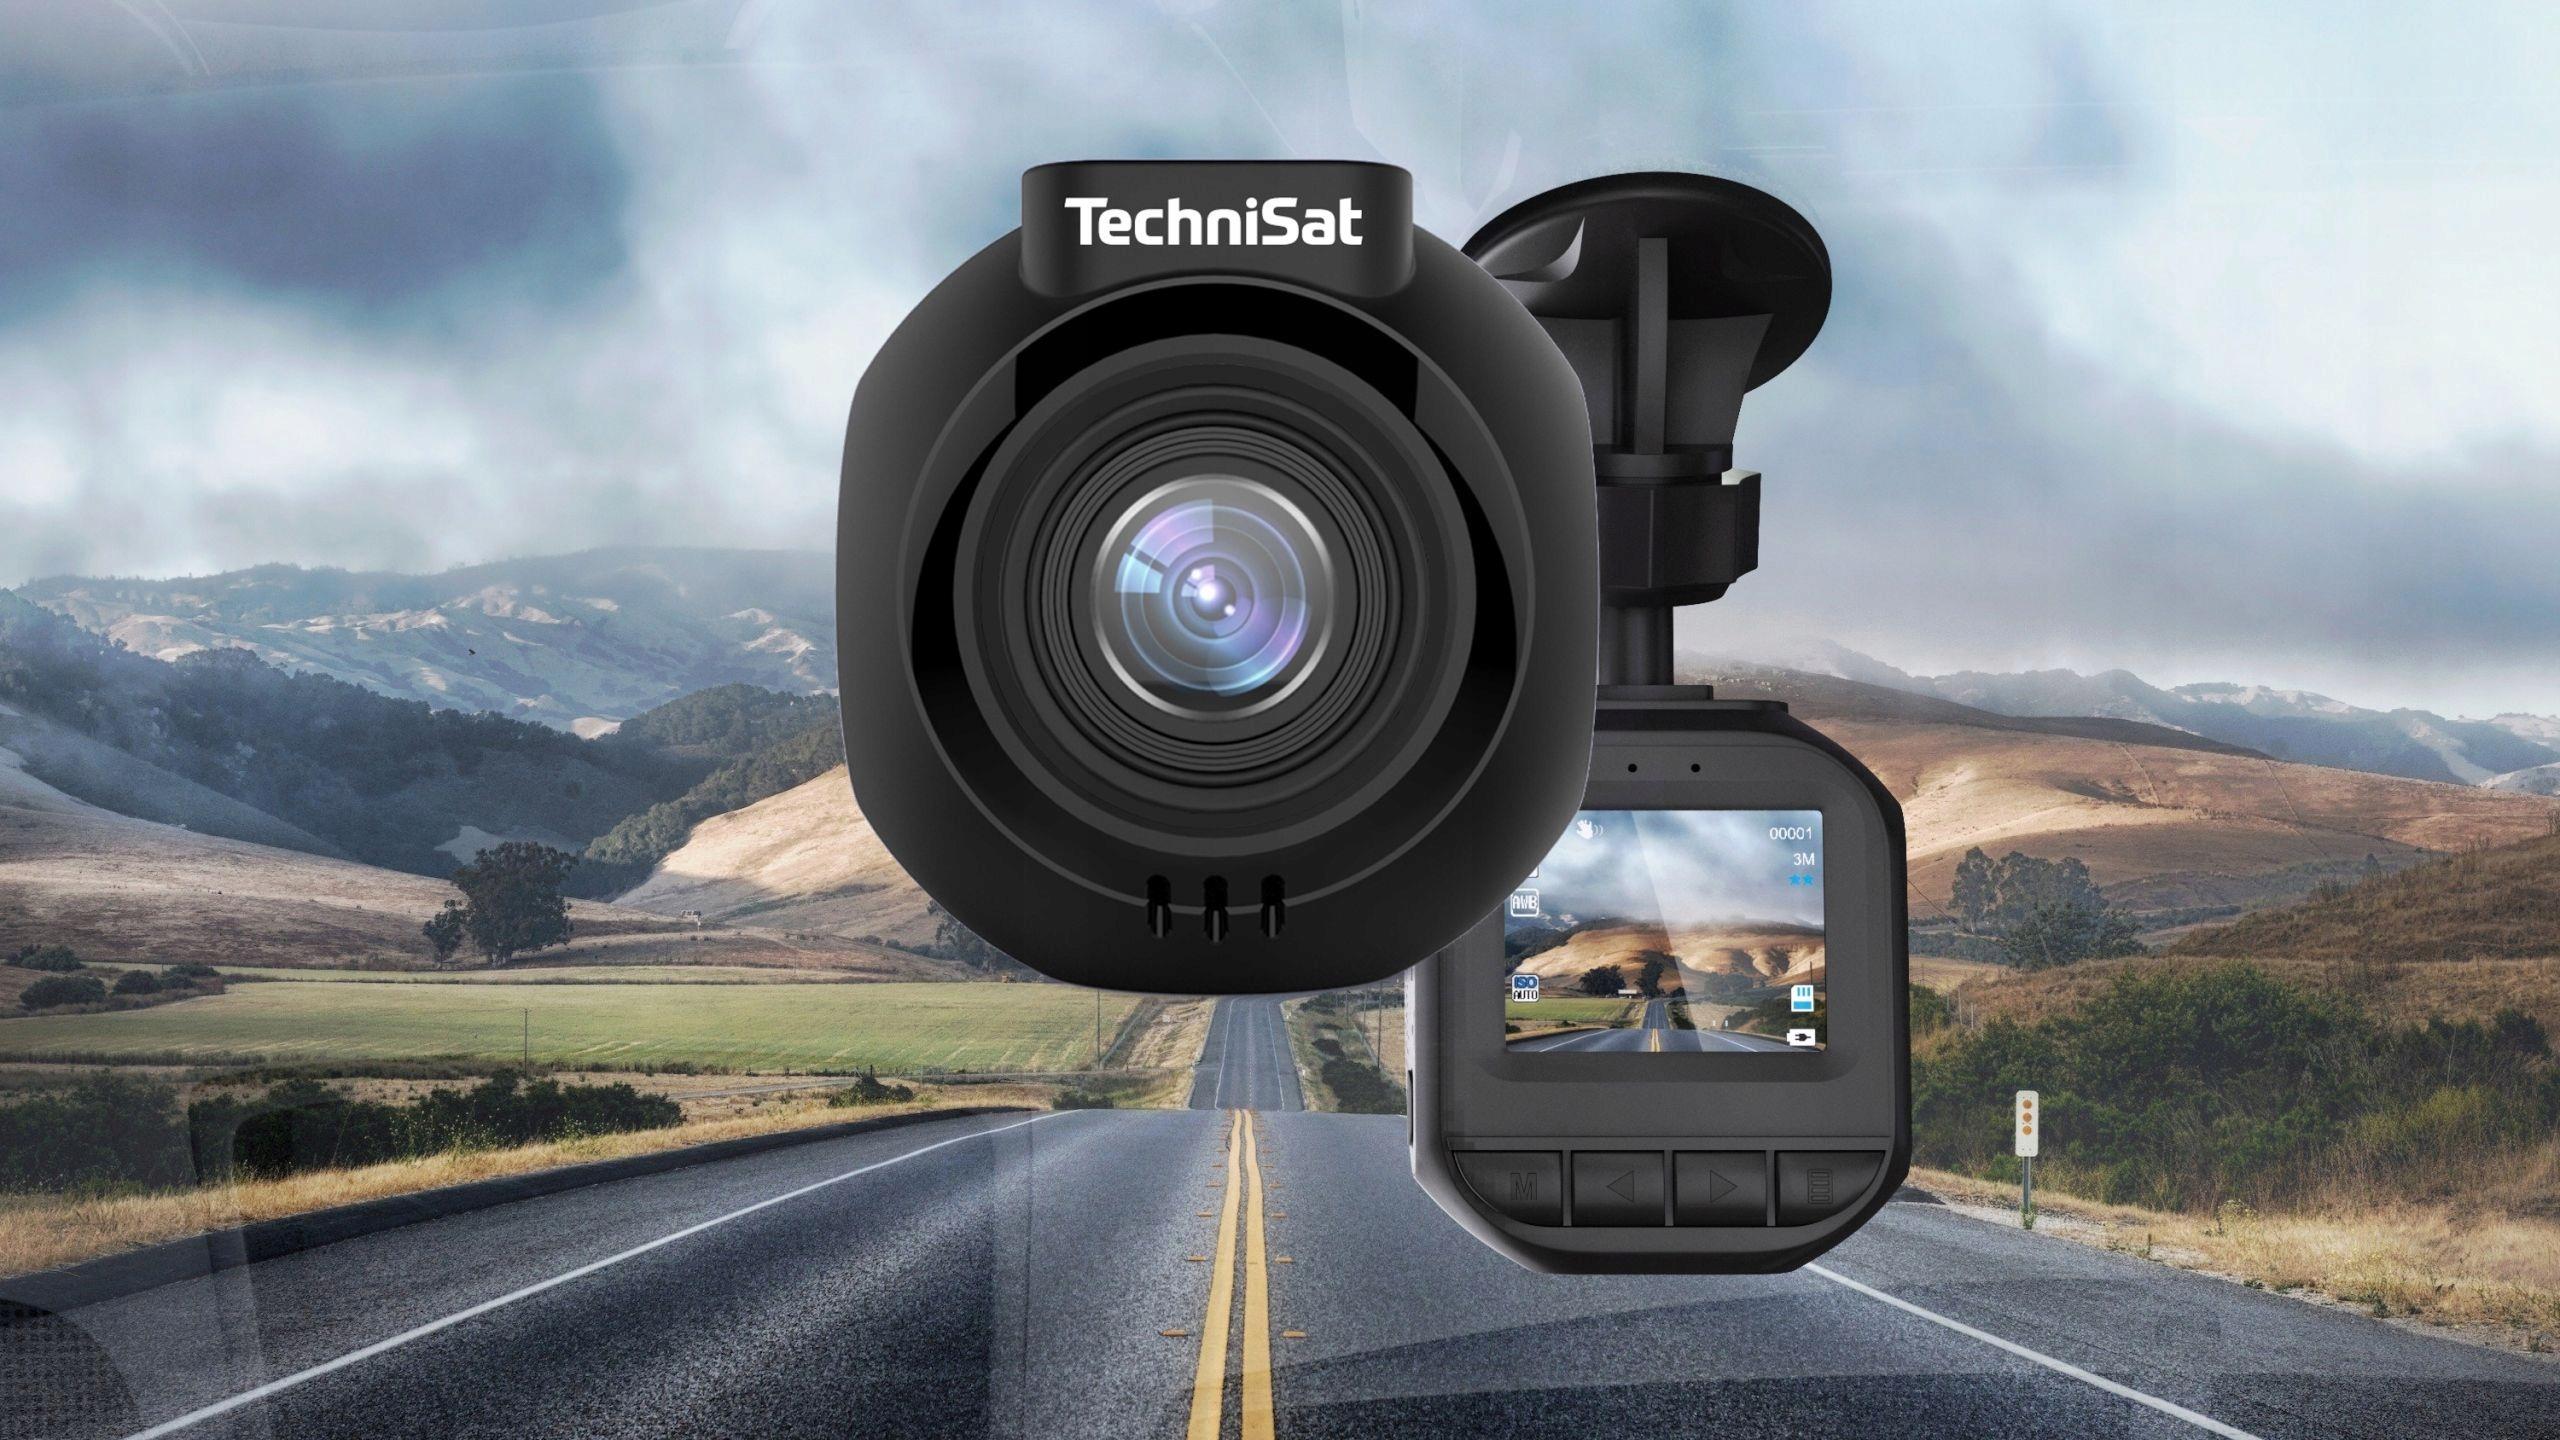 Kamera Samochodowa HD Wideo-Rejestrator Kamerka PL Jakość zapisu Full HD (1920 x 1080)